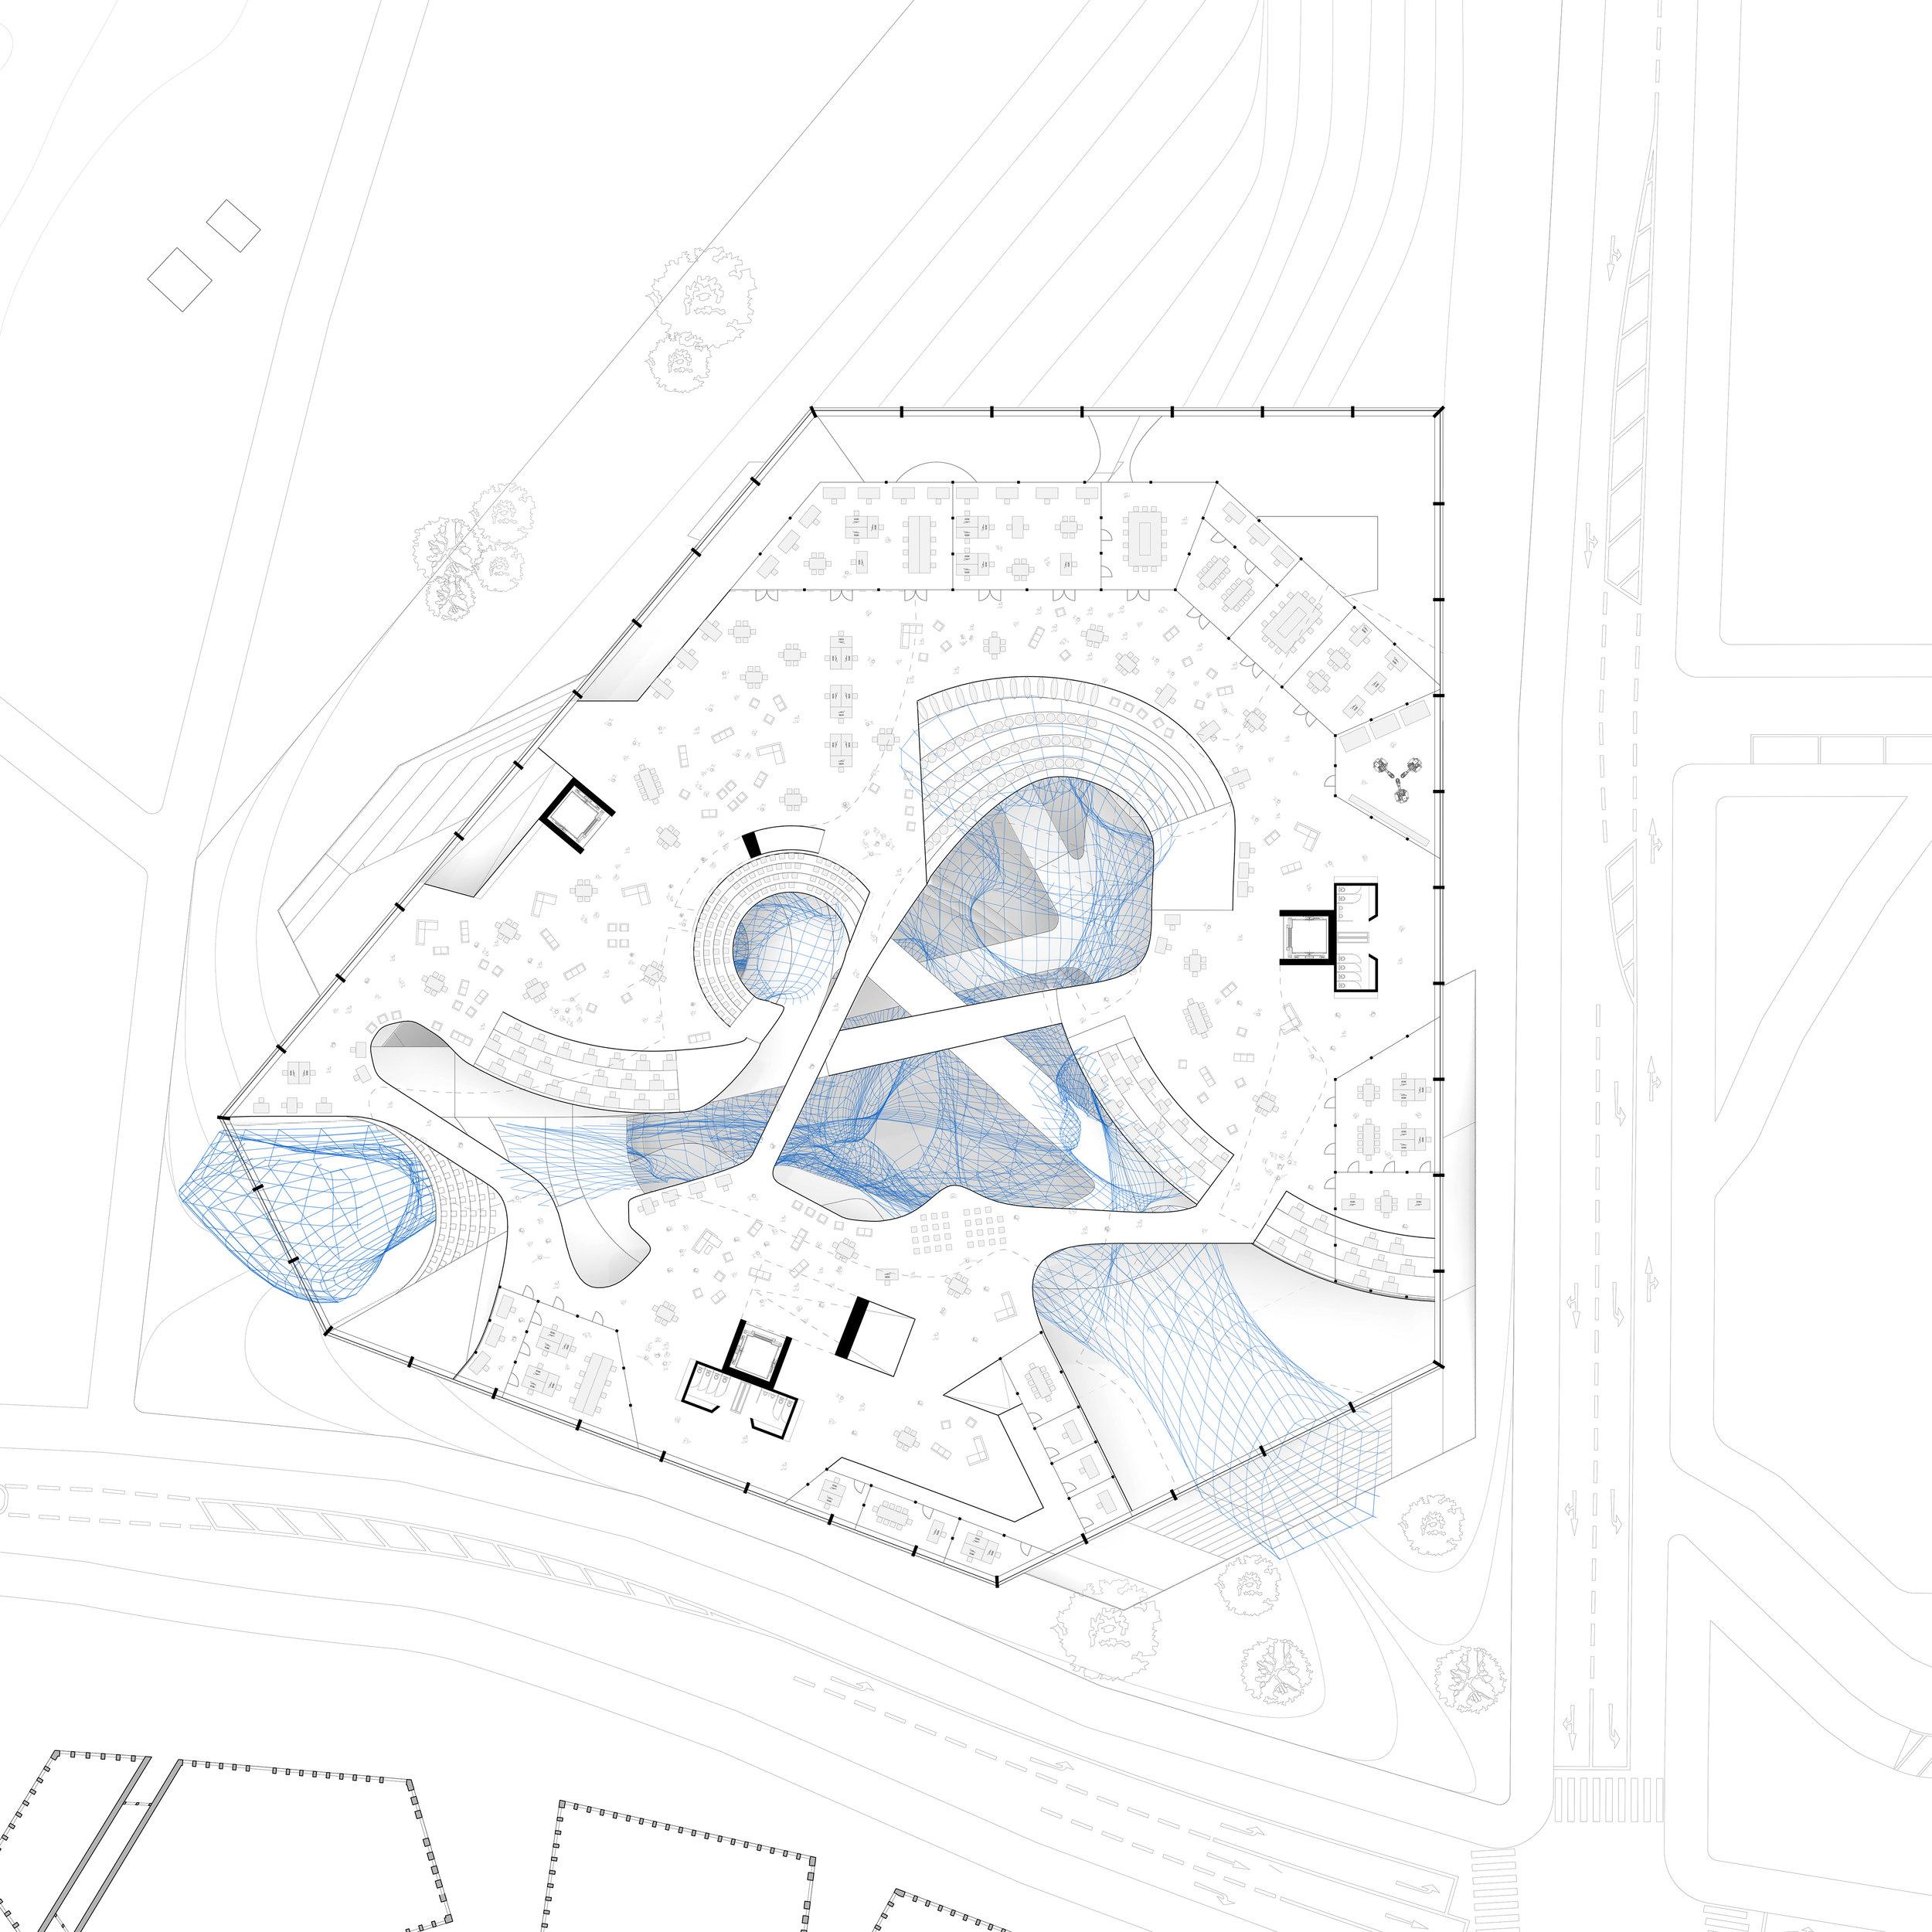 Web_adrian_jan_newAngewandte_floorplan3_CROPPED_SS16_PRINT.jpg